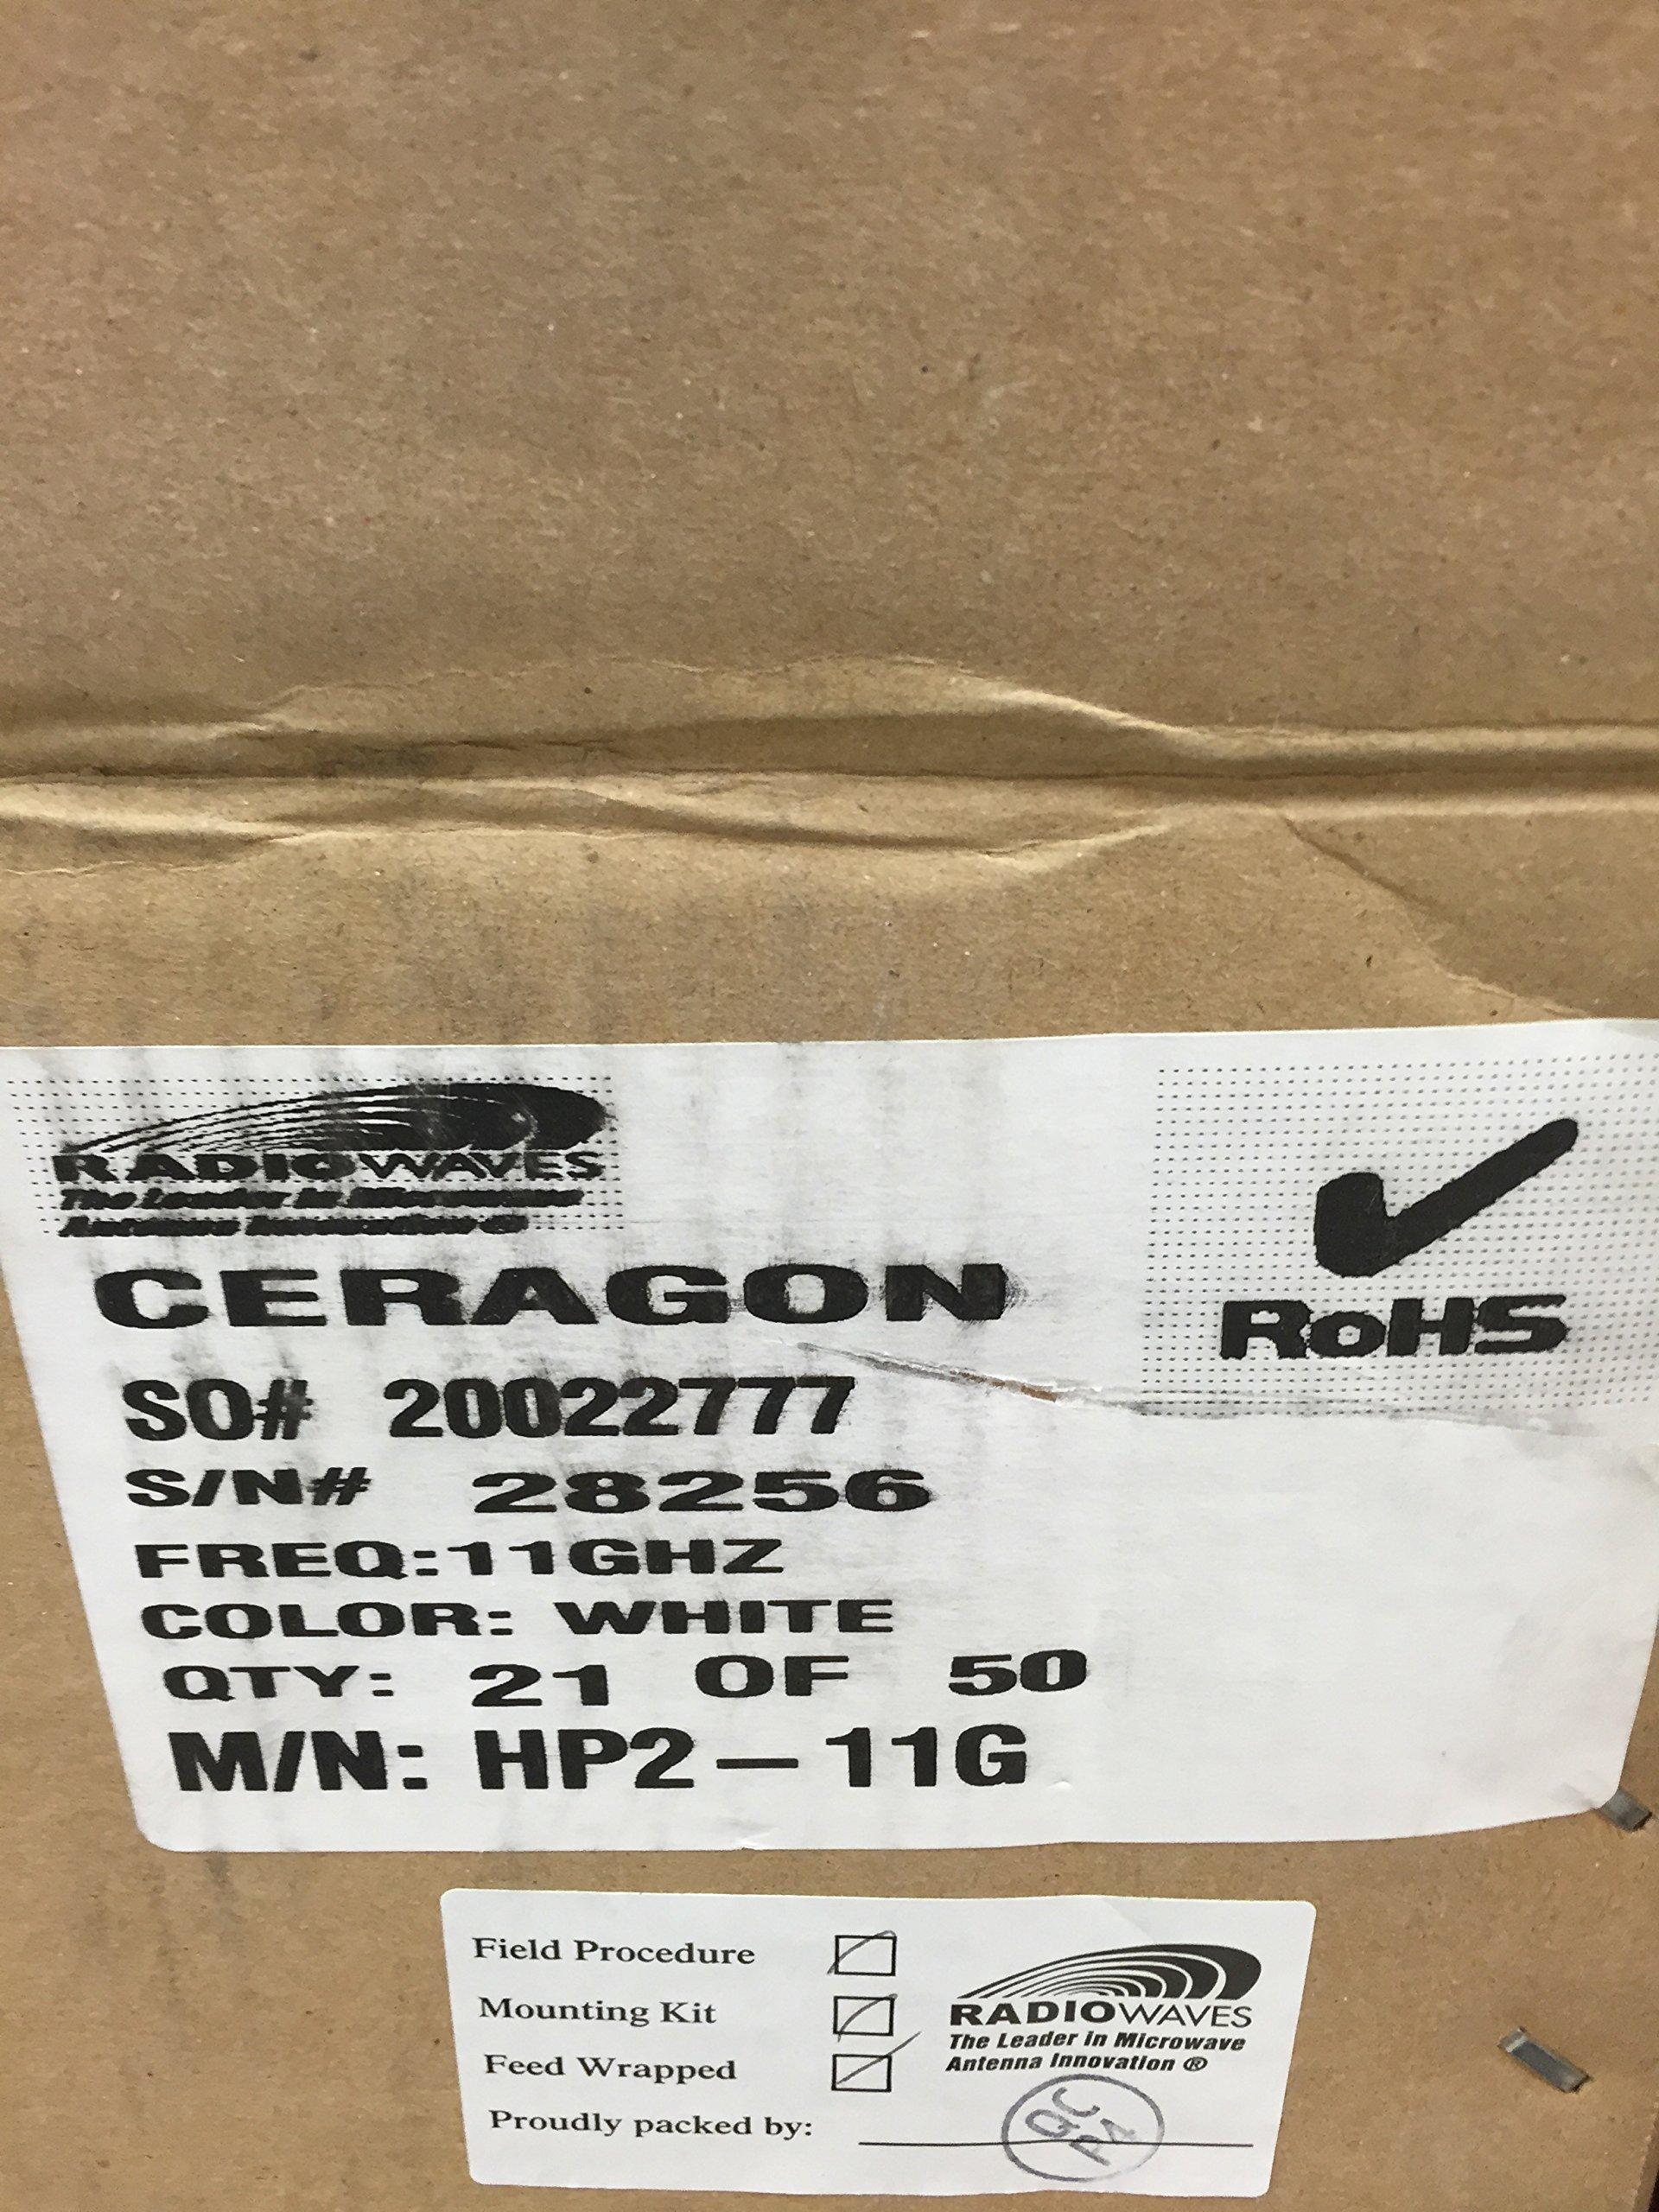 Buy Ceragon Now!